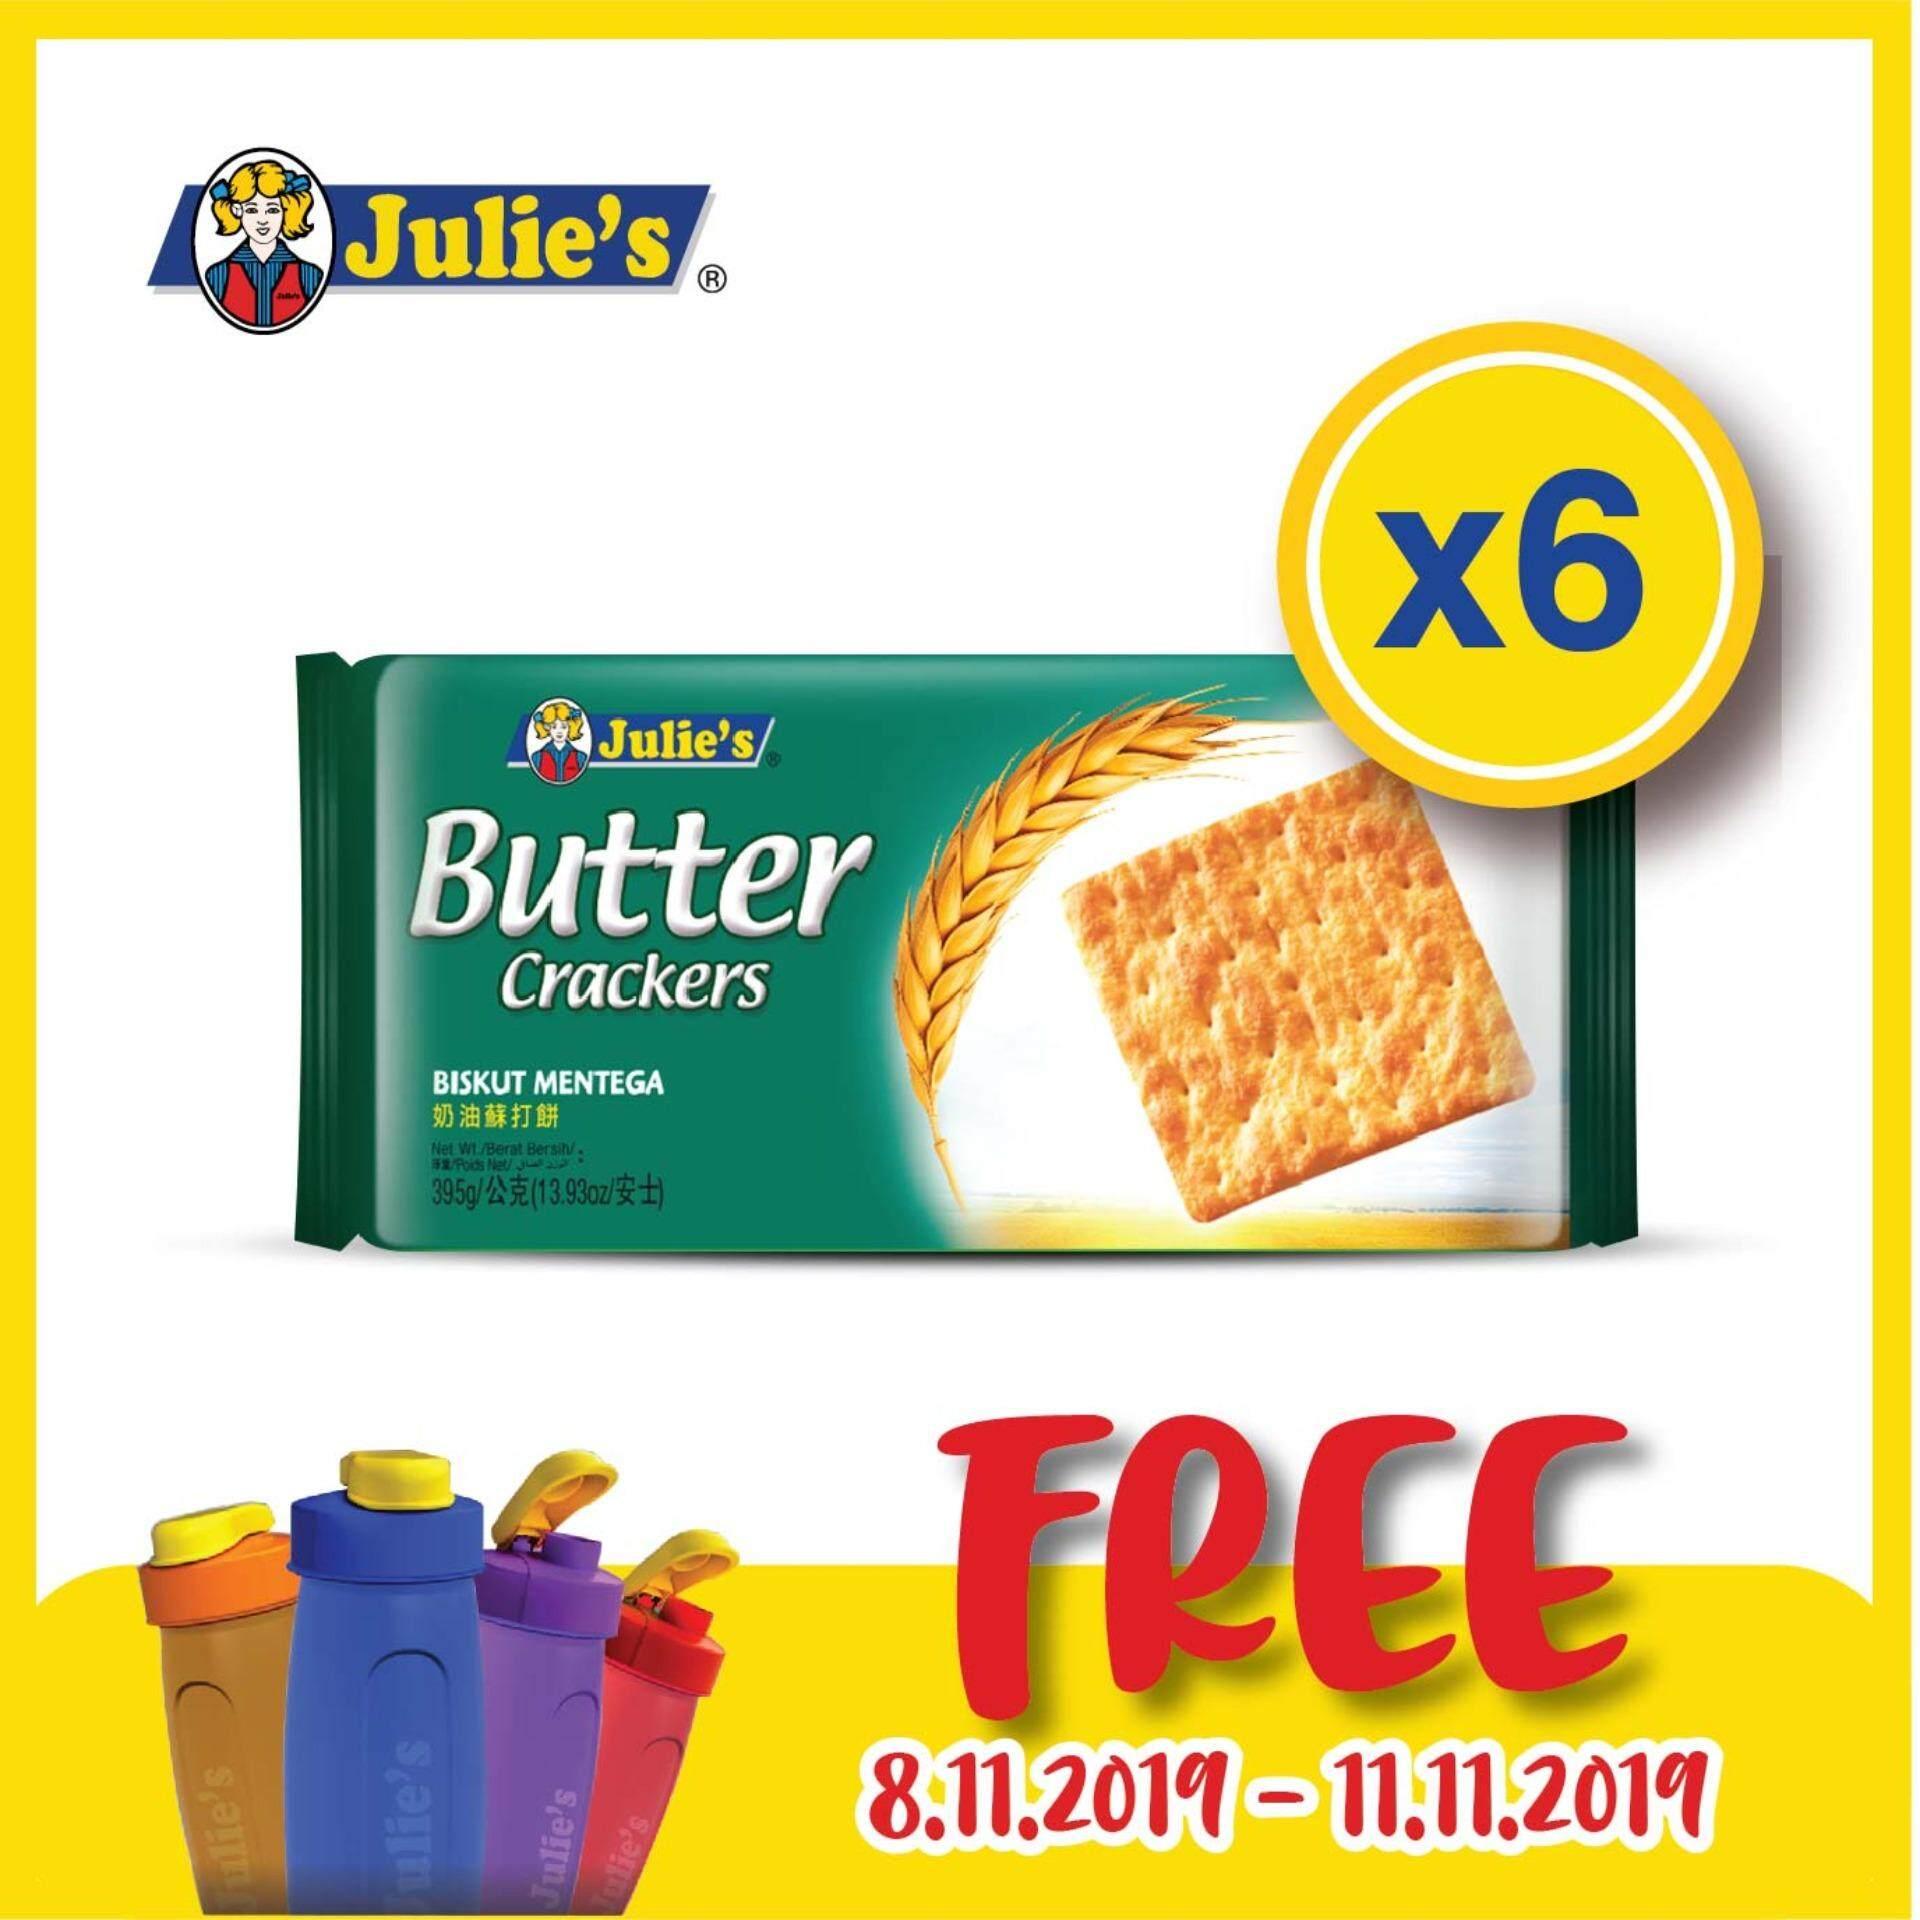 Julie's Butter Crackers 200g x 6 Packs + Free 1 Water Tumbler